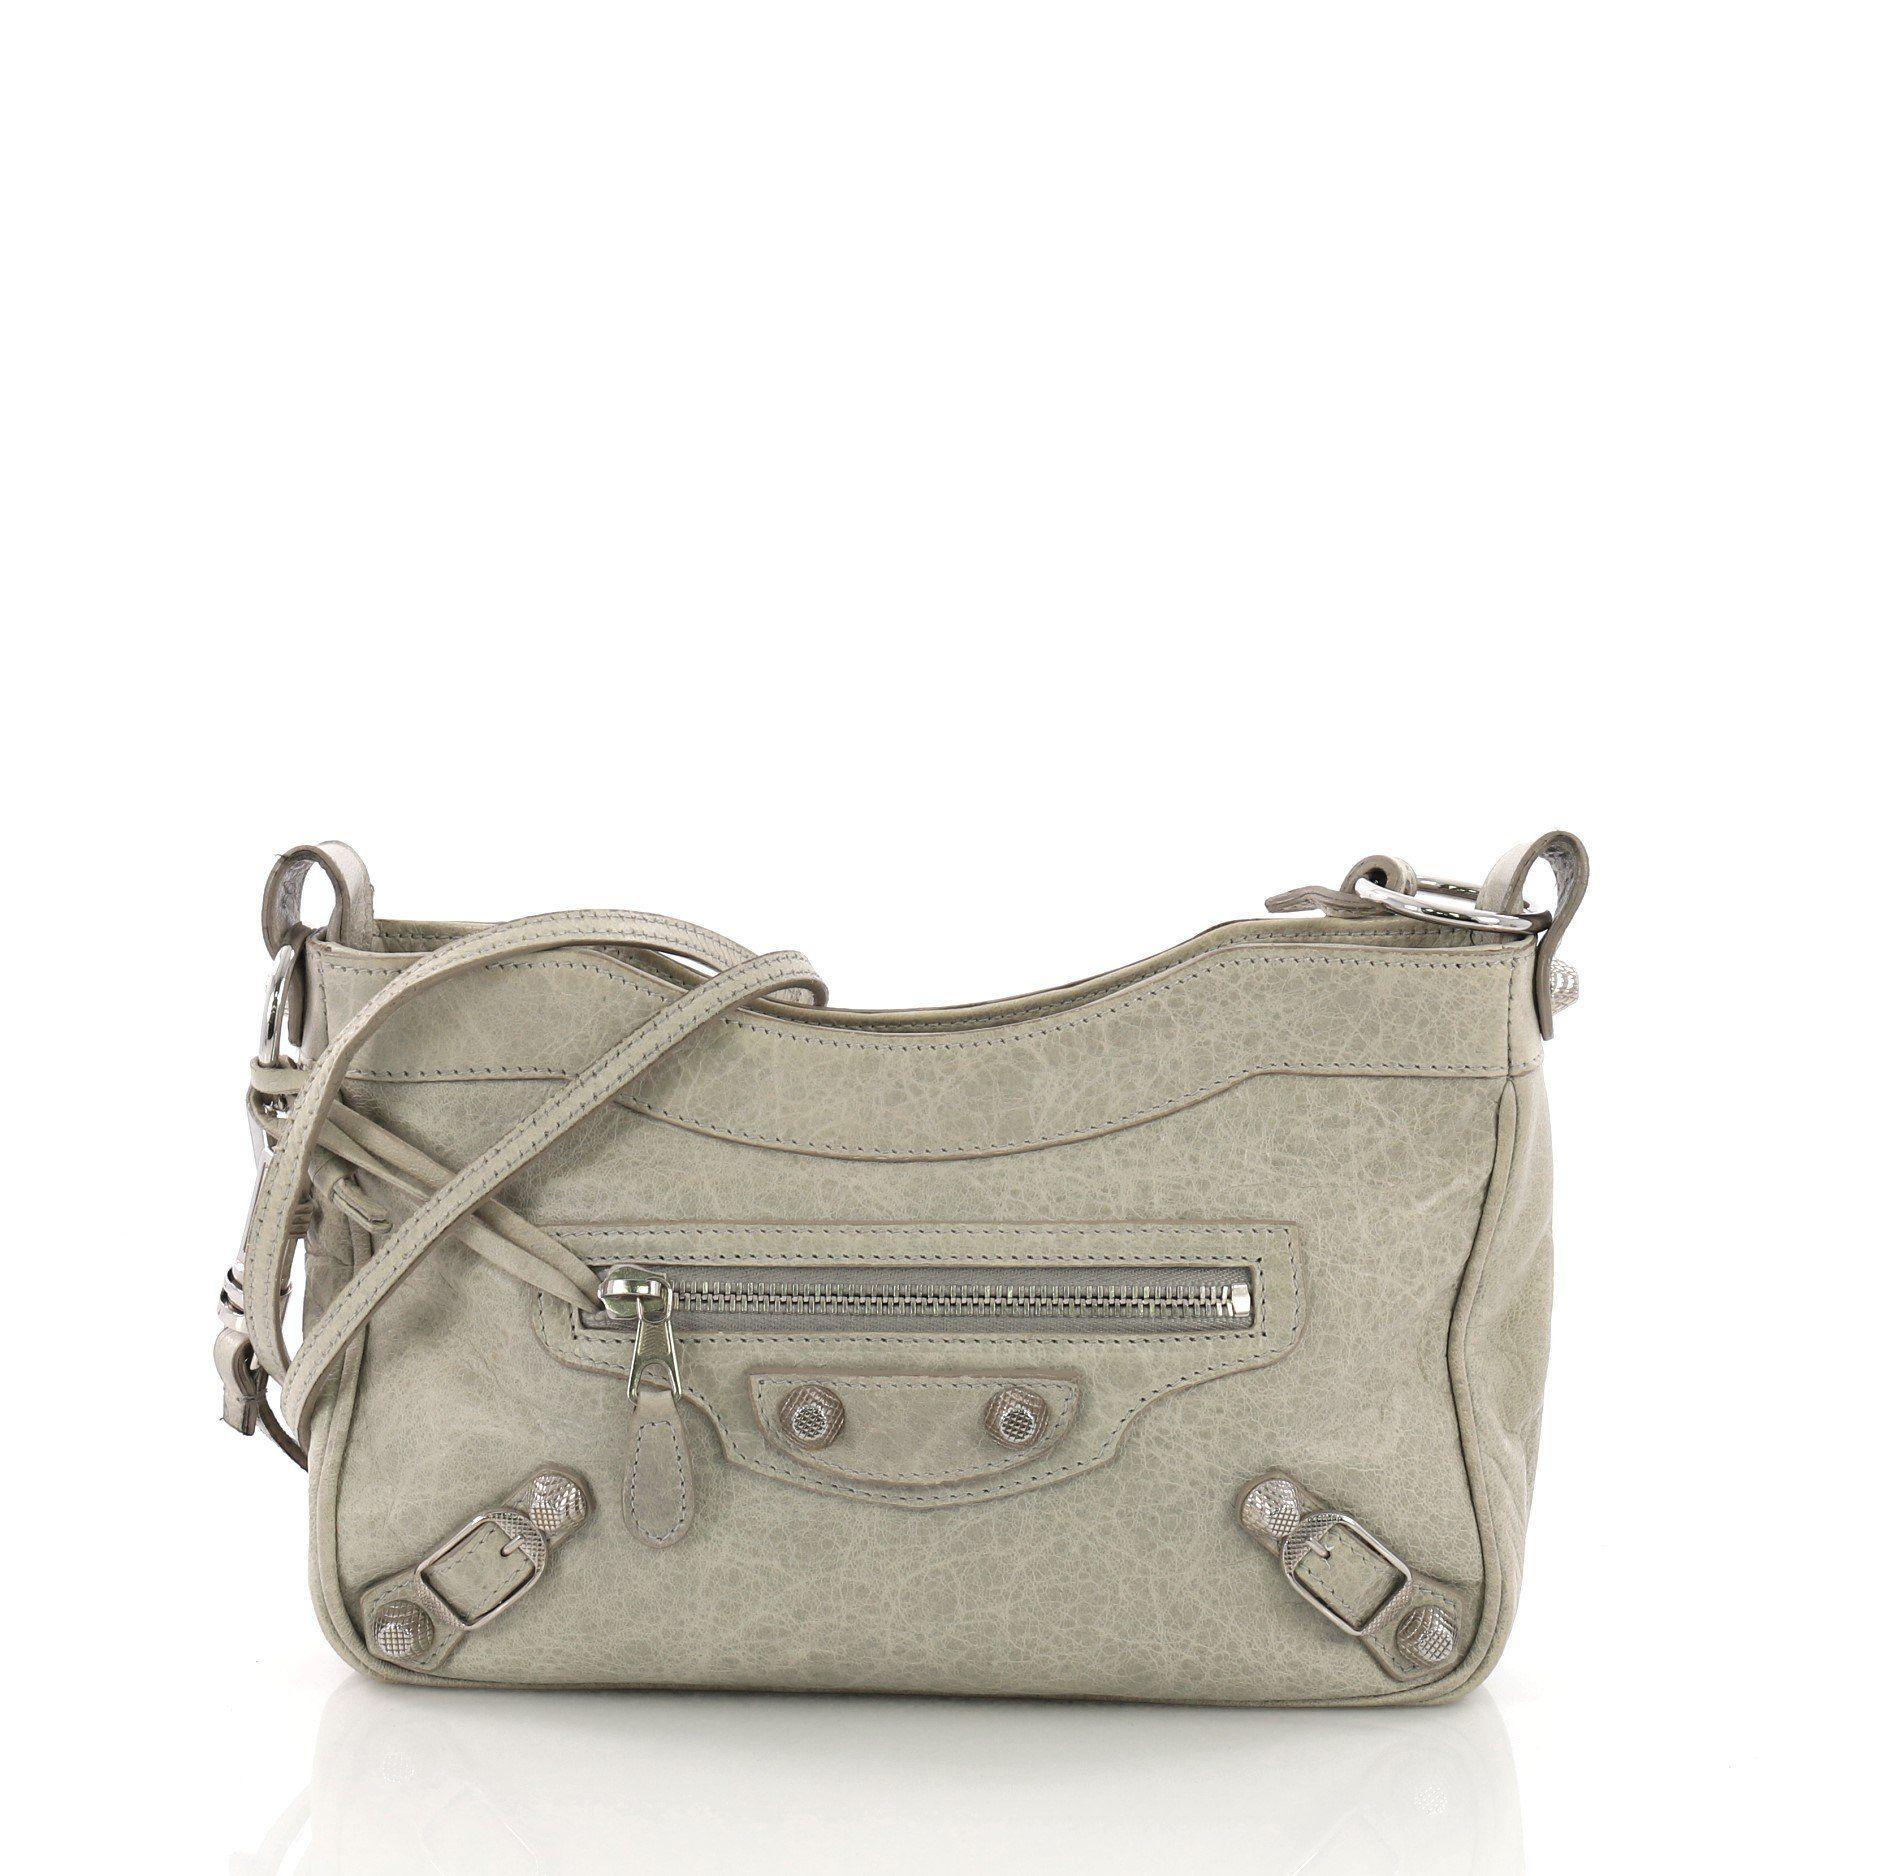 a40731b92aca15 balenciaga--Pre-Owned-Hip-Classic-Studs-Crossbody-Bag-Leather.jpeg